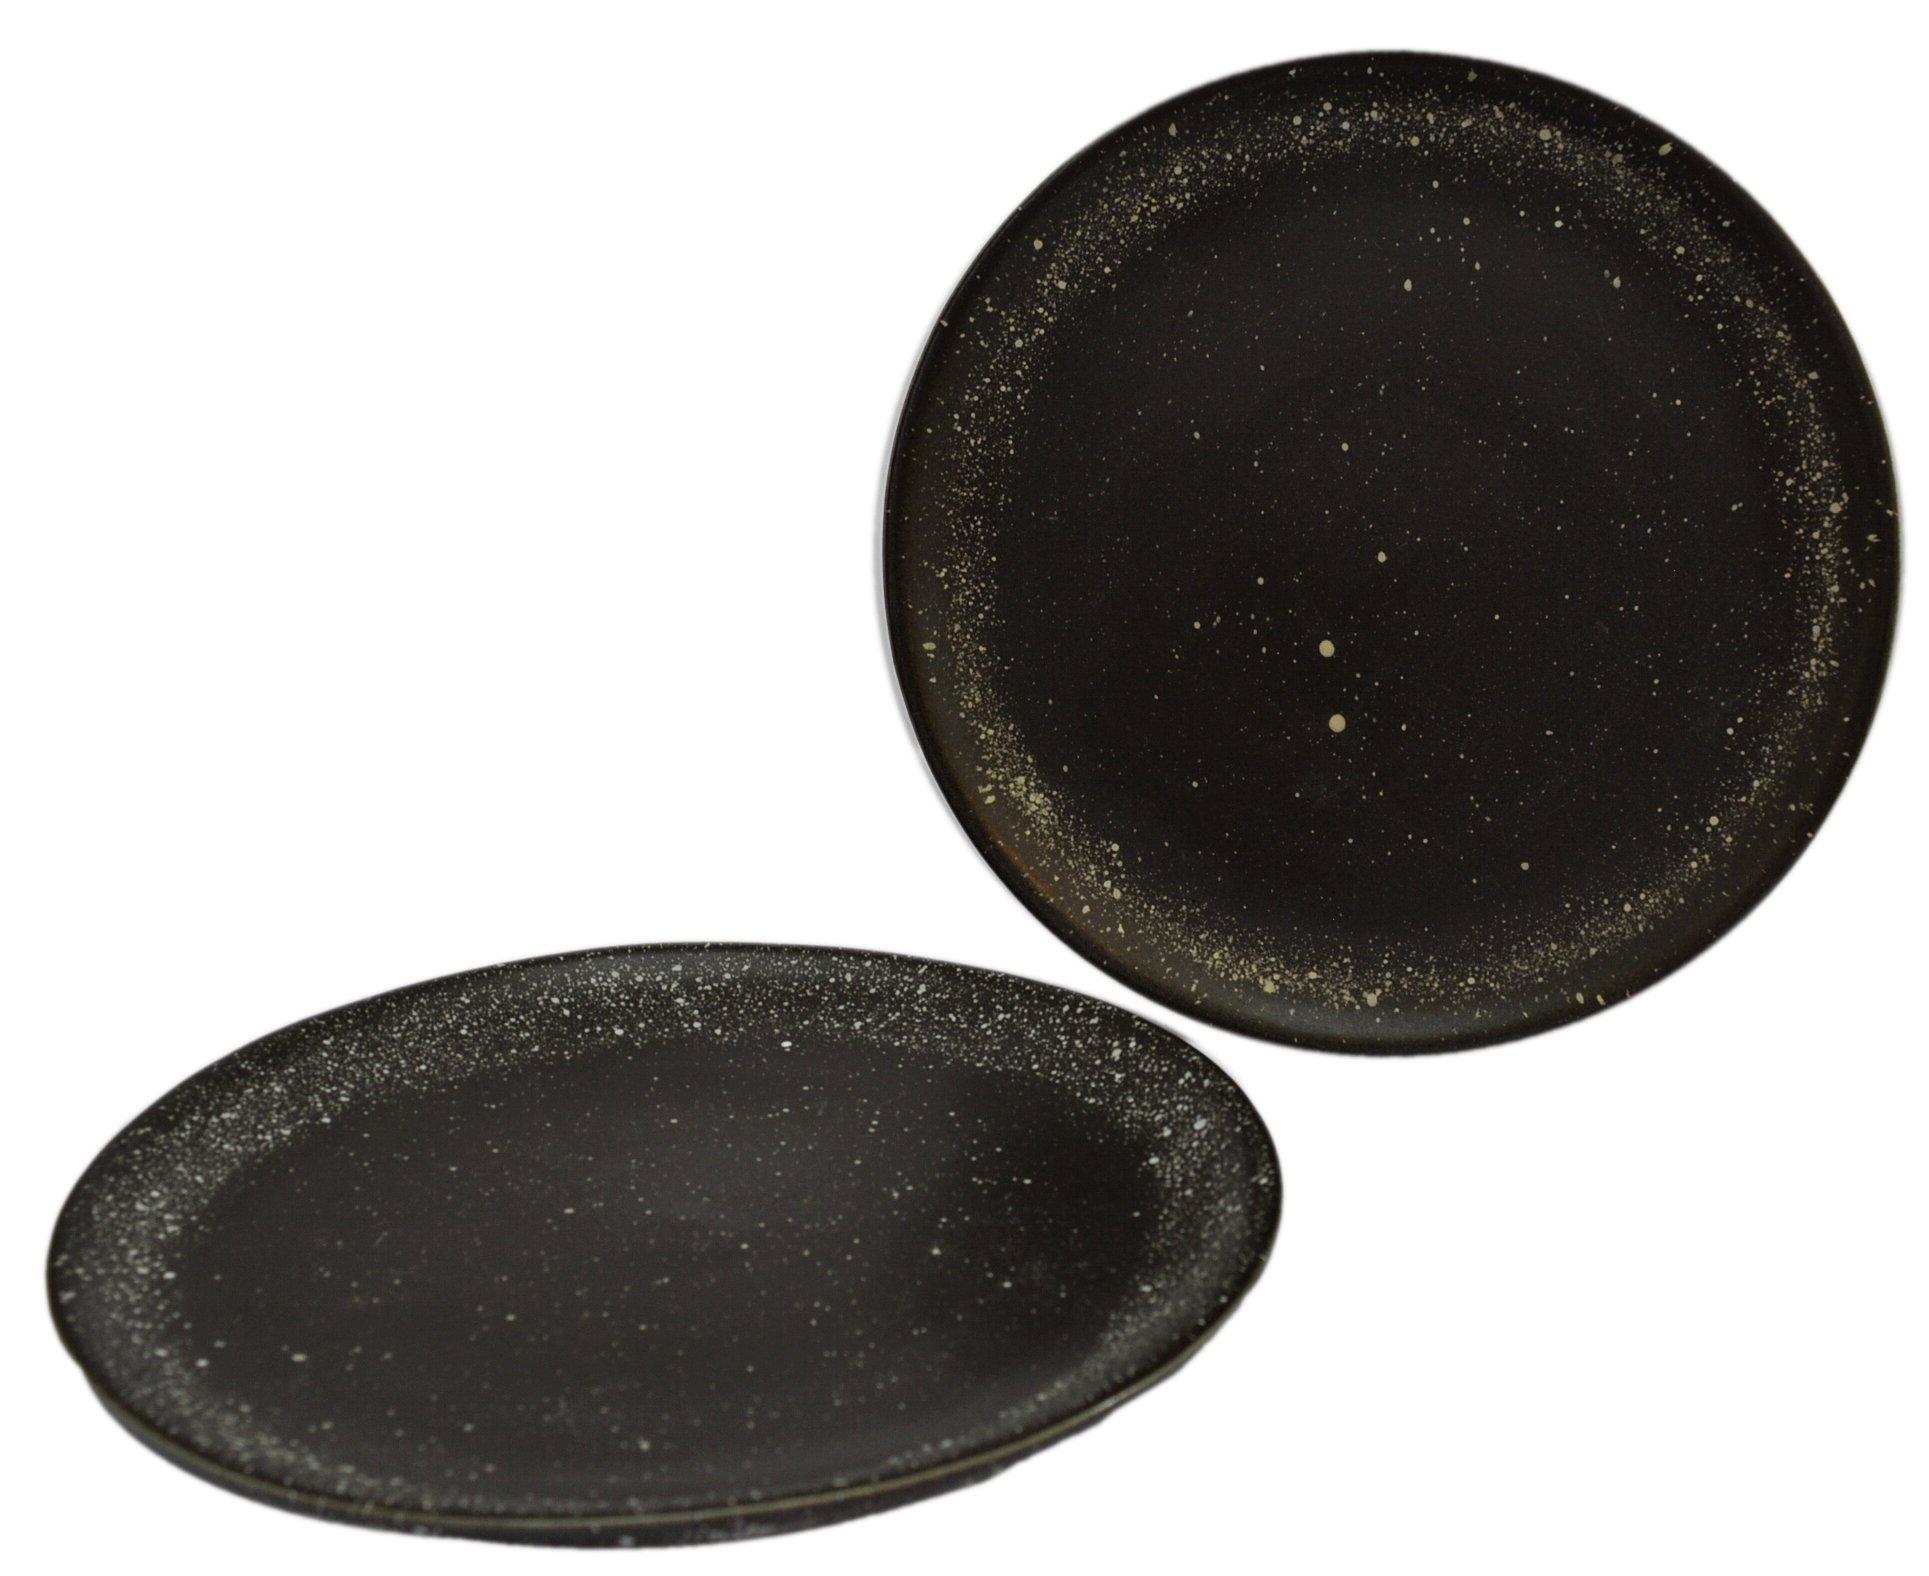 RoRo Ceramic Stoneware Matte Black Speckled Appetizer Plate Set of 2, 8 Inch